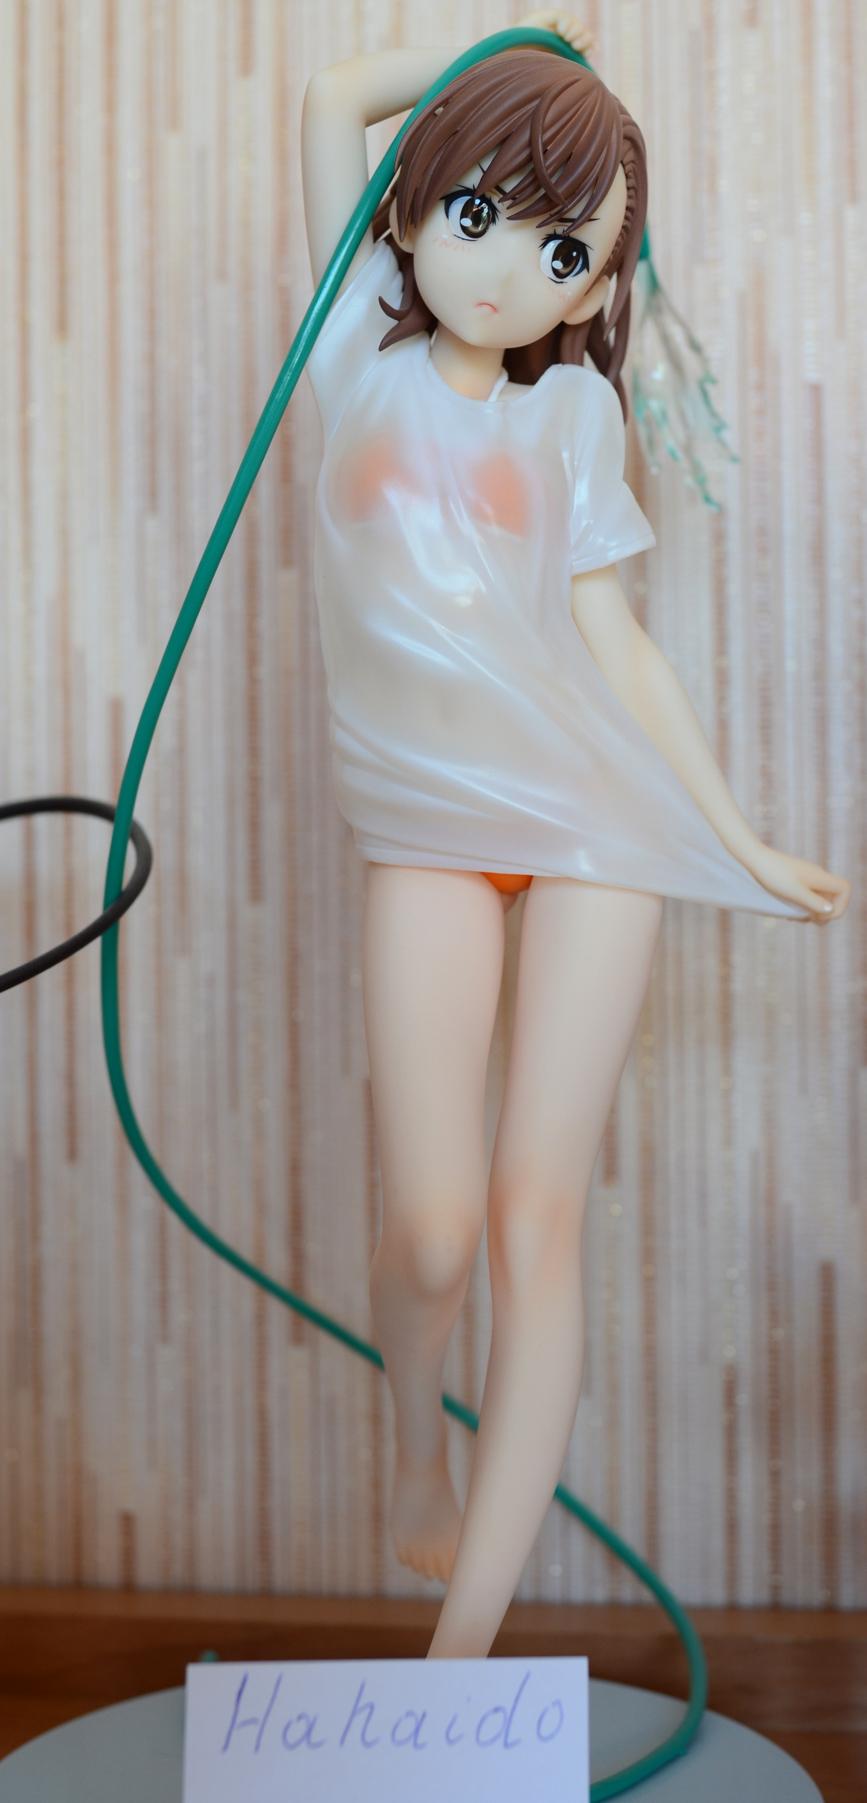 Misaka Mikoto DX Swimsuit Ver. - Лавочка Hahaido - My